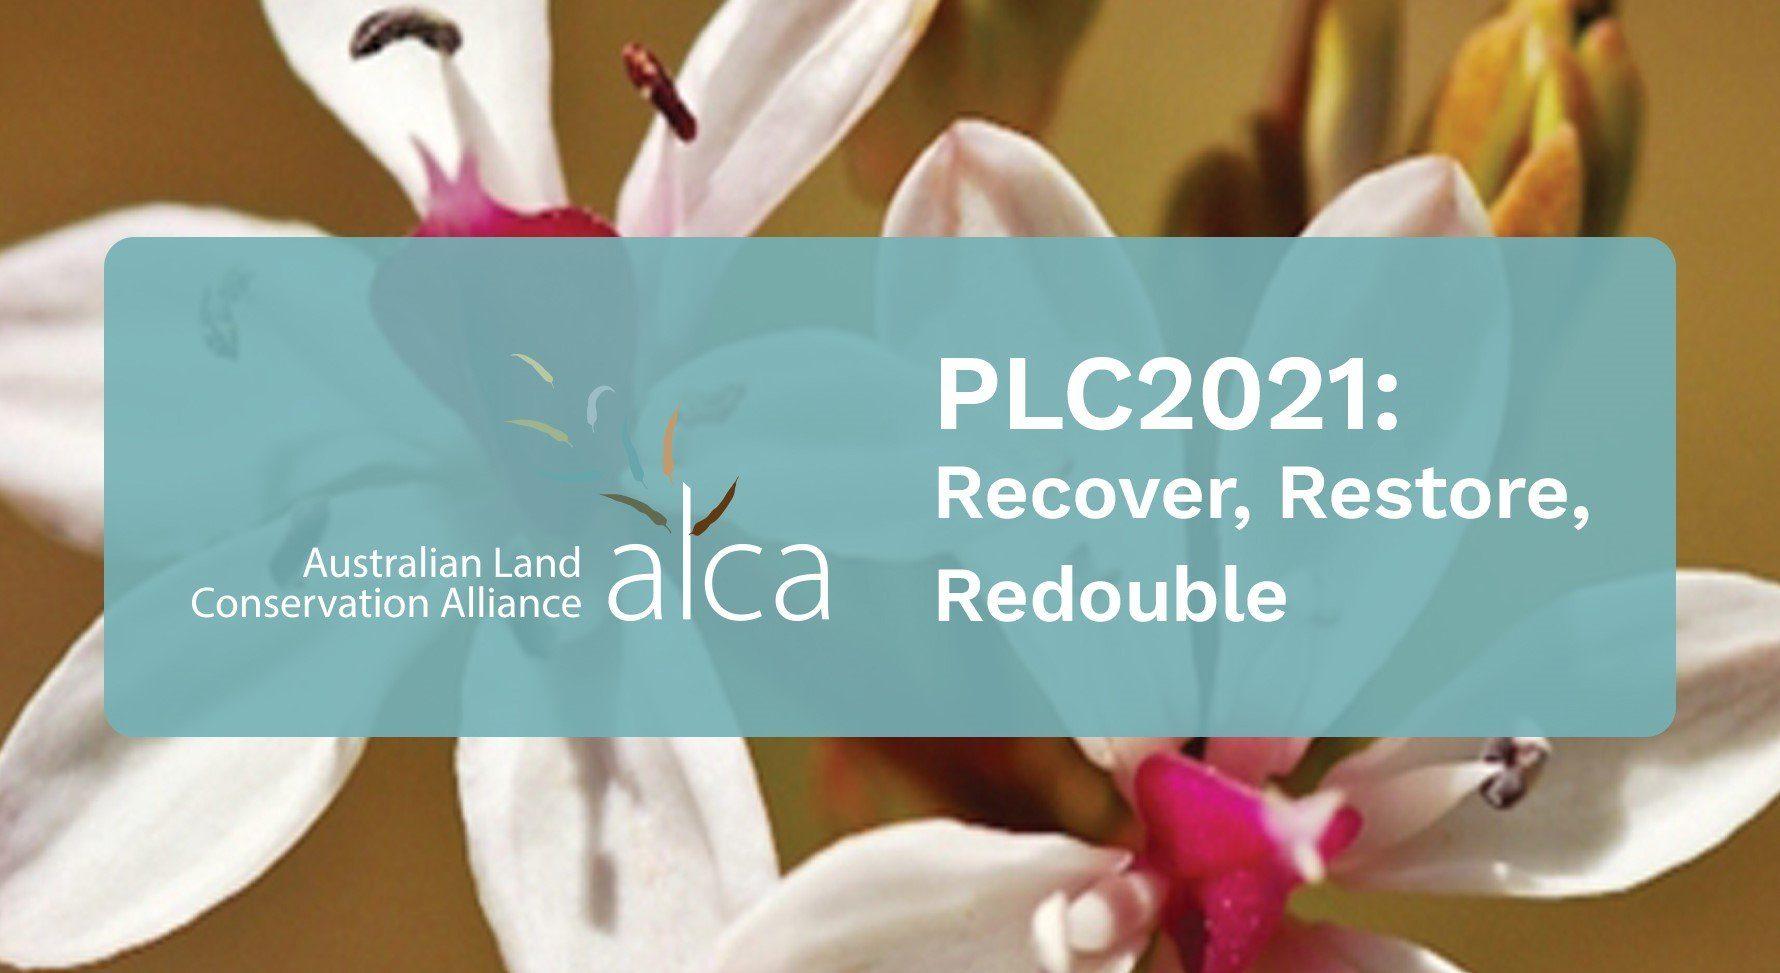 PLC2021 Recover Restore Redouble